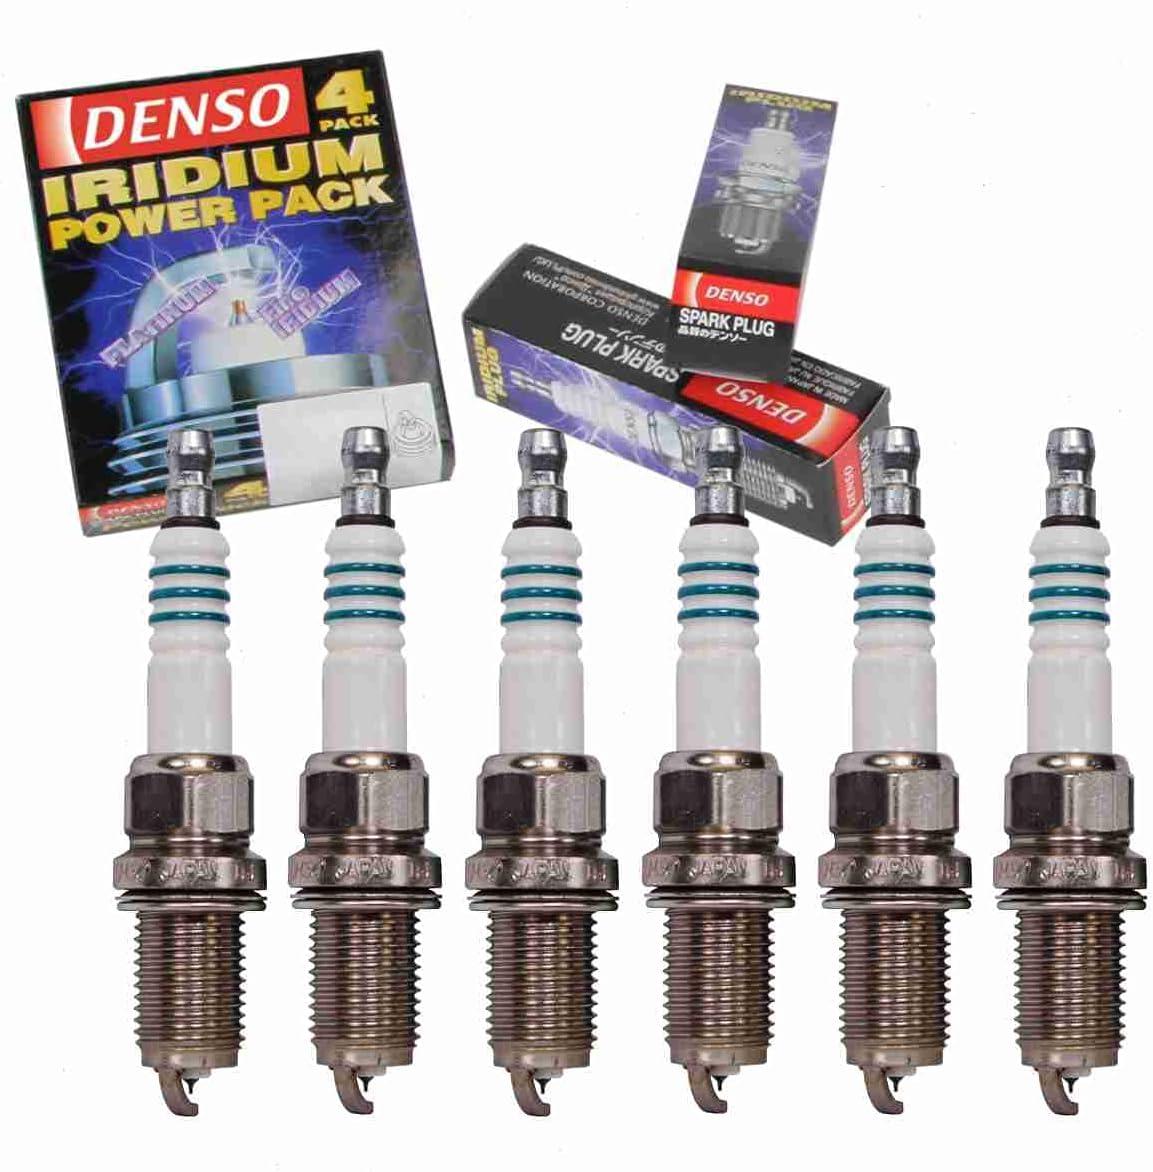 6 pc ブランド買うならブランドオフ DENSO Iridium Power with Plugs Mitsubishi compatible 男女兼用 Spark